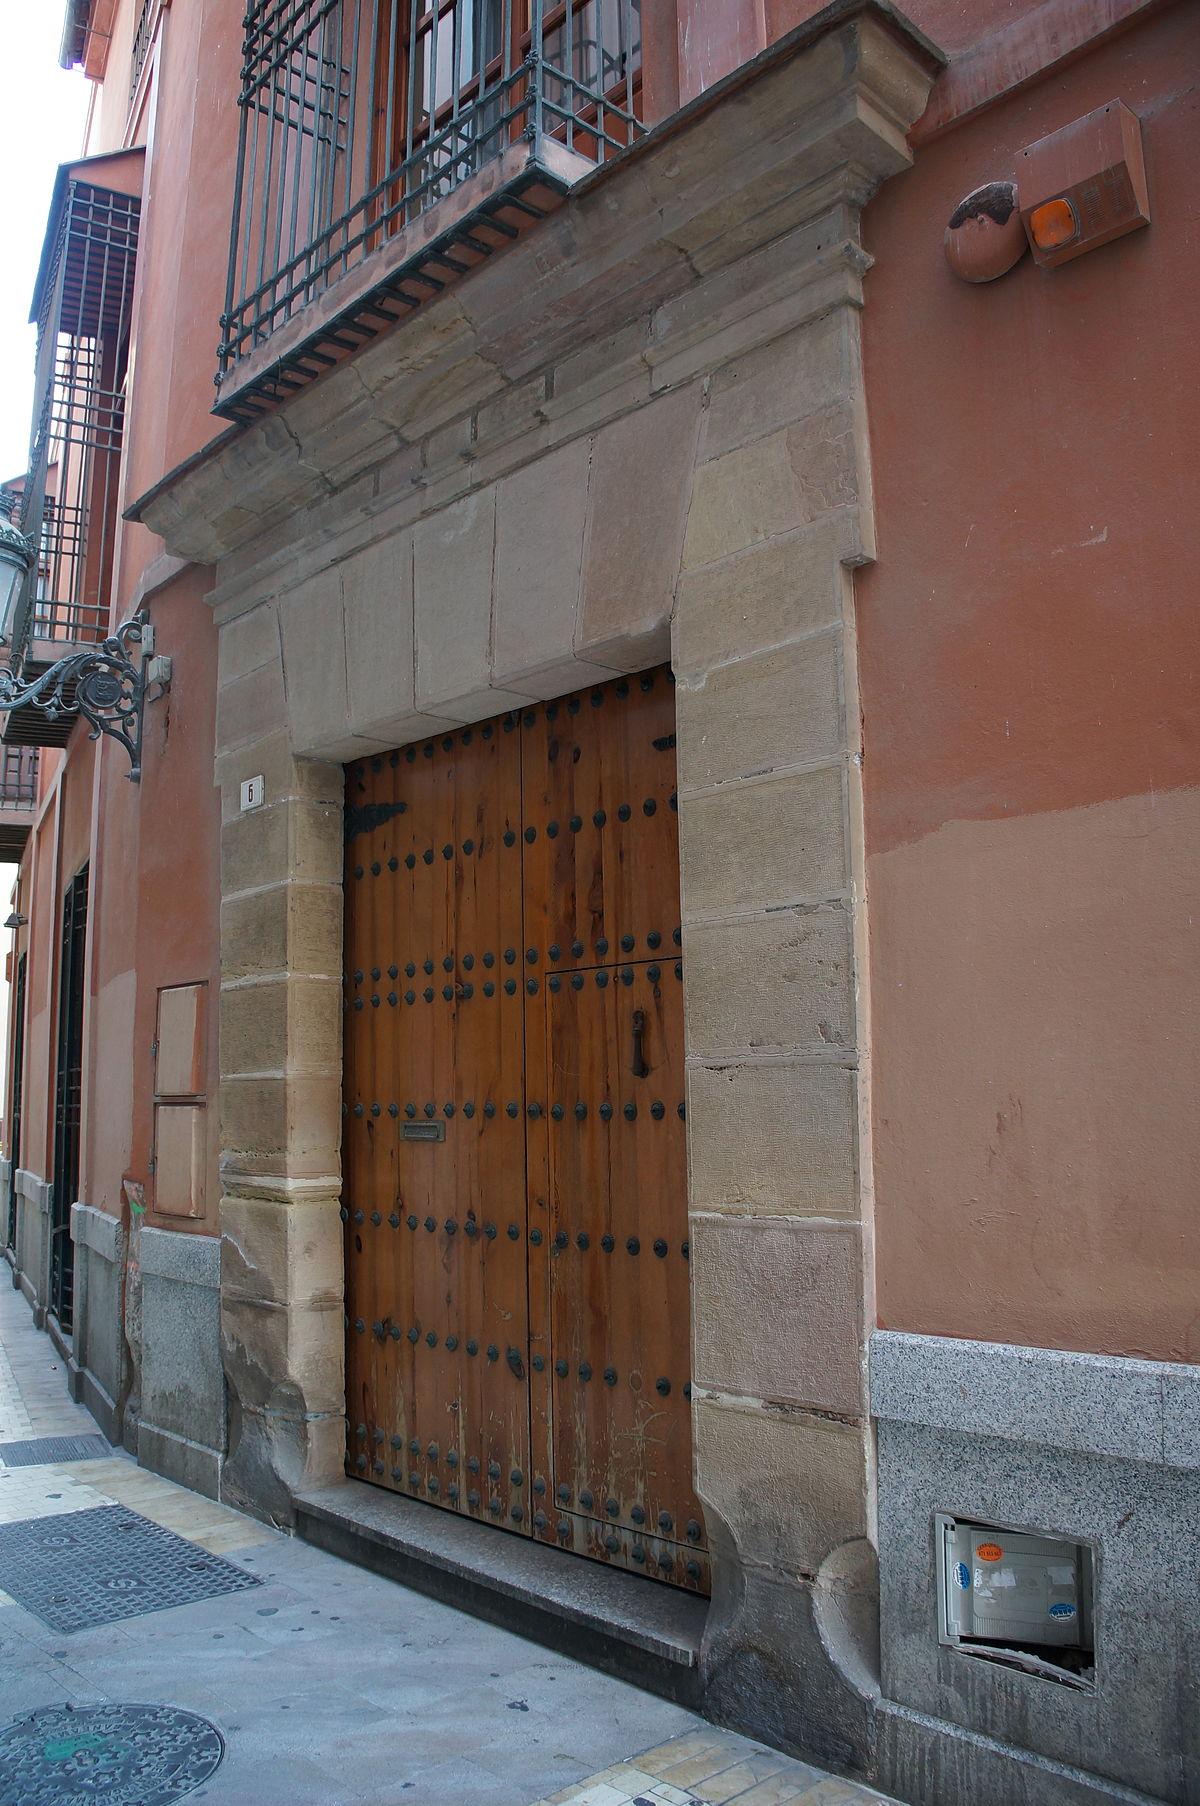 Casa palacio de salinas m laga wikipedia la for Casas modernas wikipedia